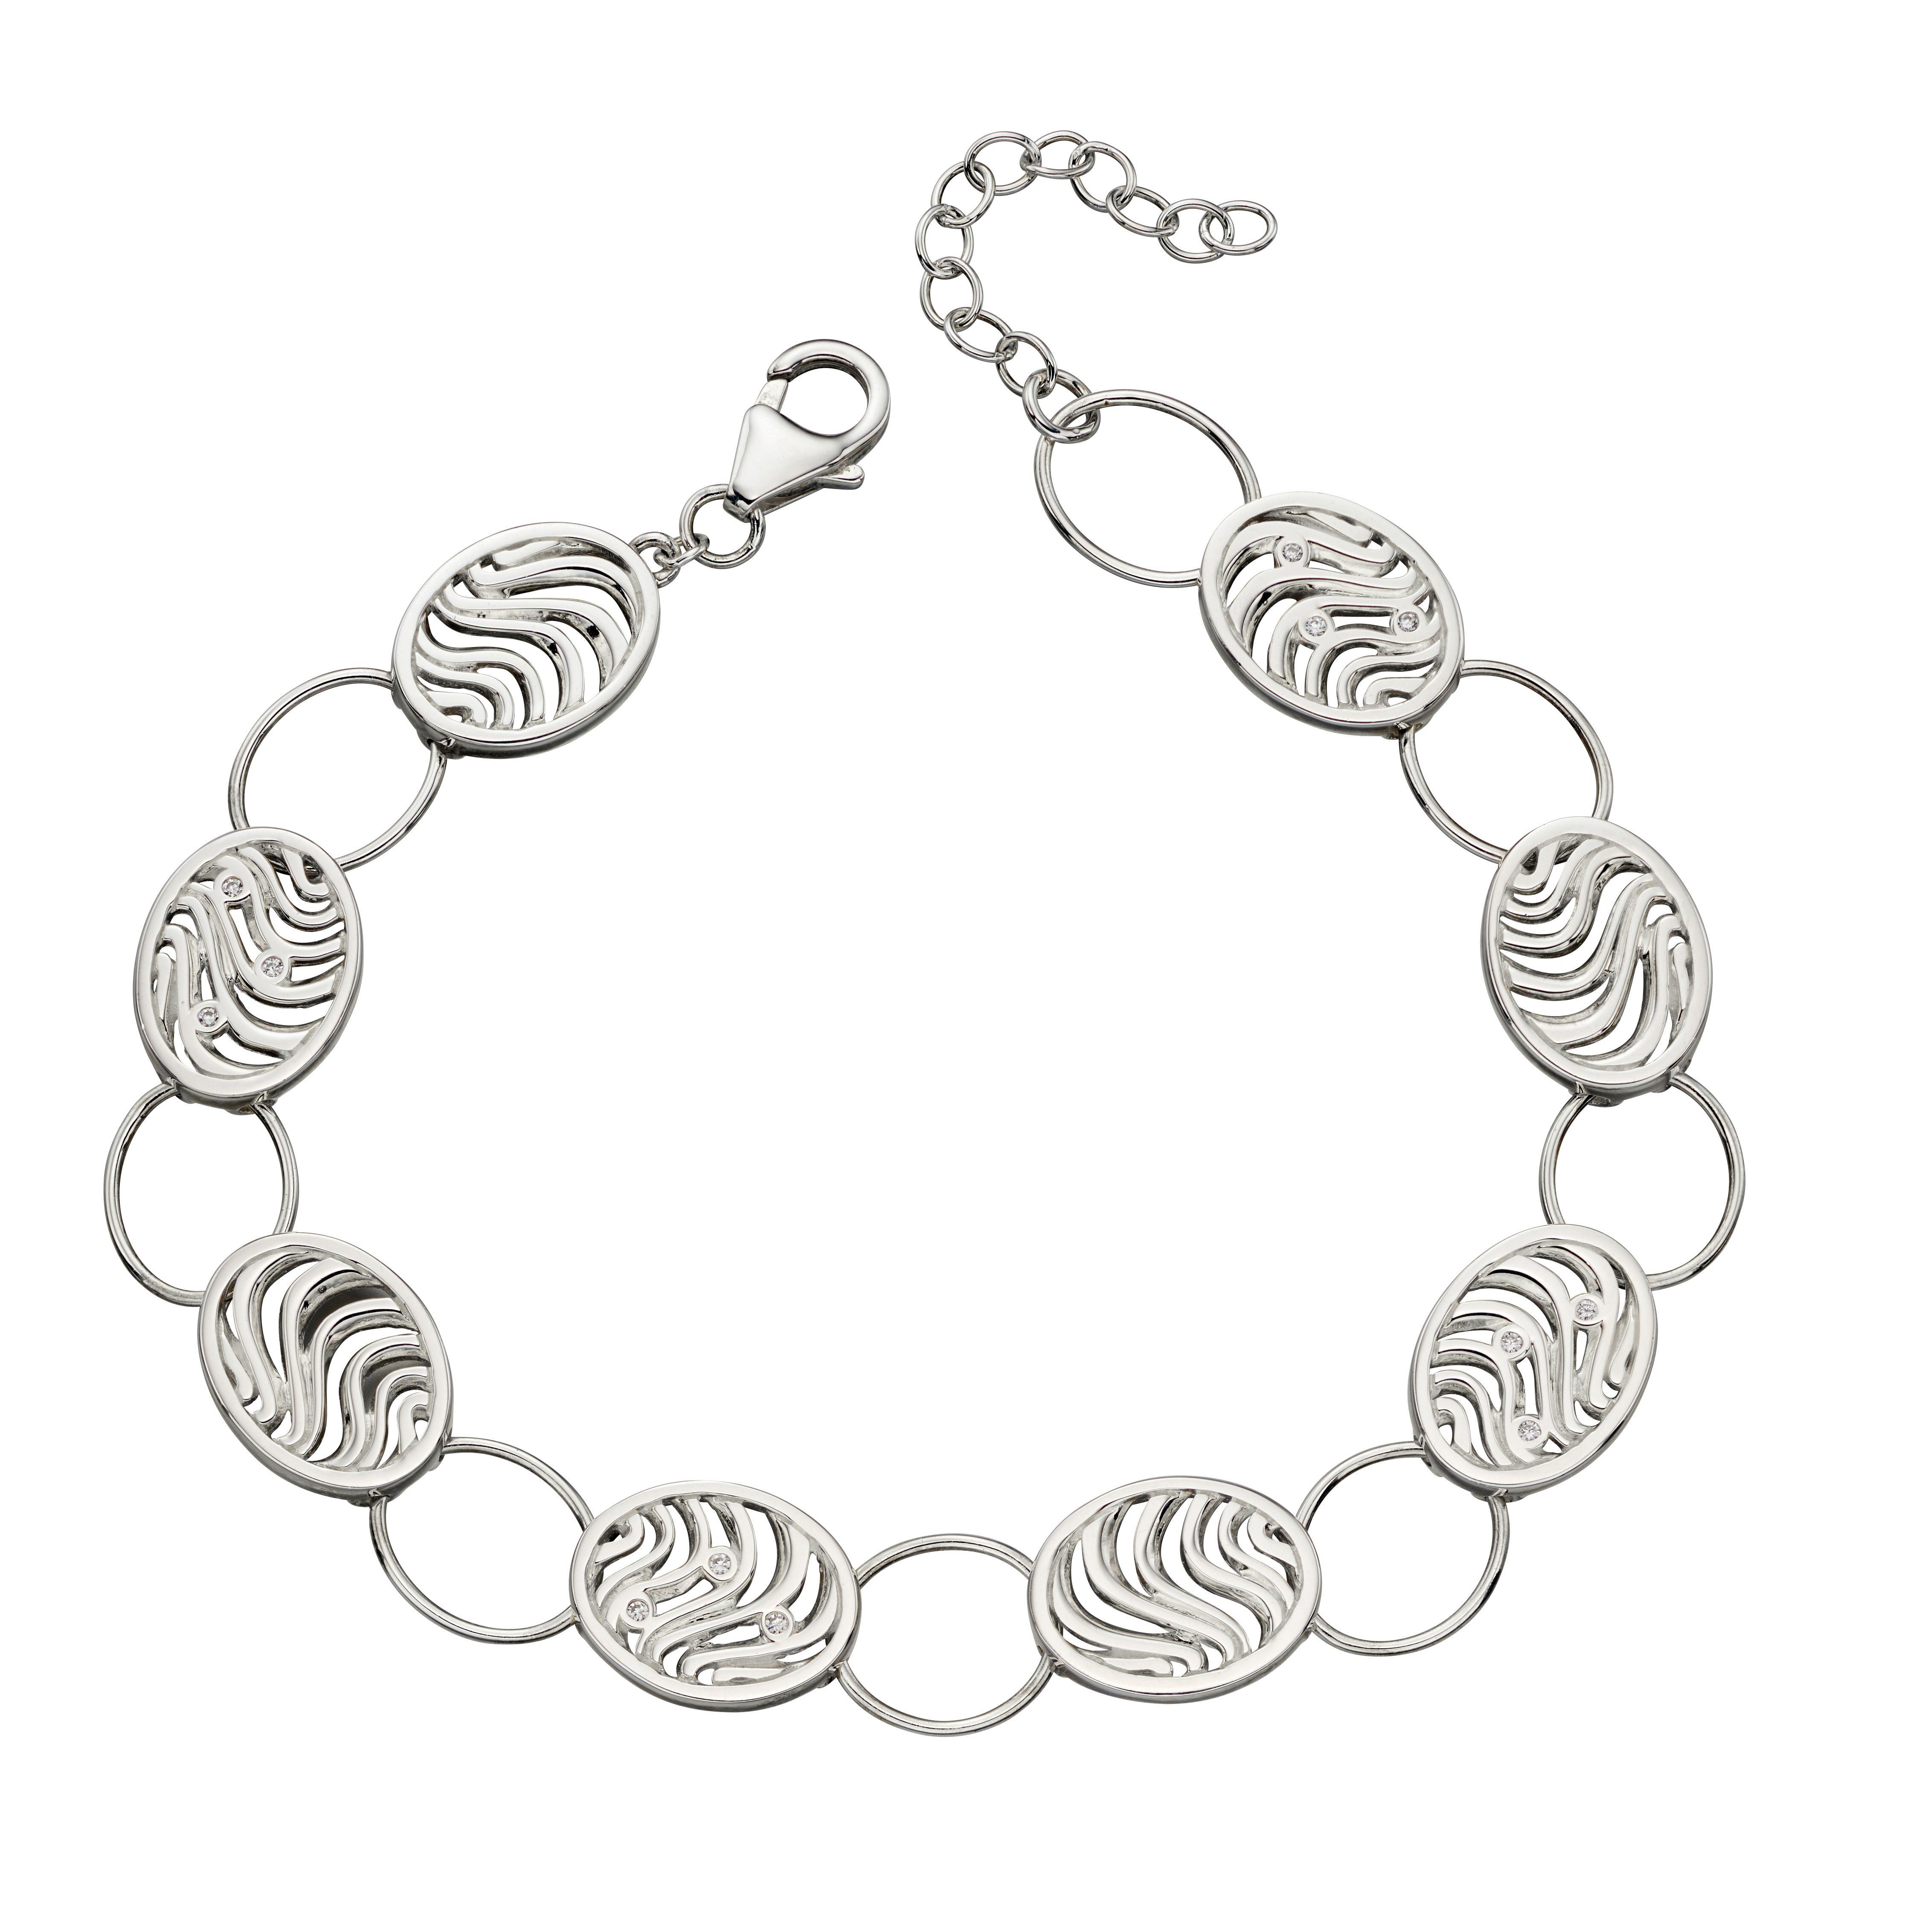 Elements Silver Womens 925 Sterling Silver Cubic Zirconia Oval Link Bracelet of Length 21.5cm B5018C